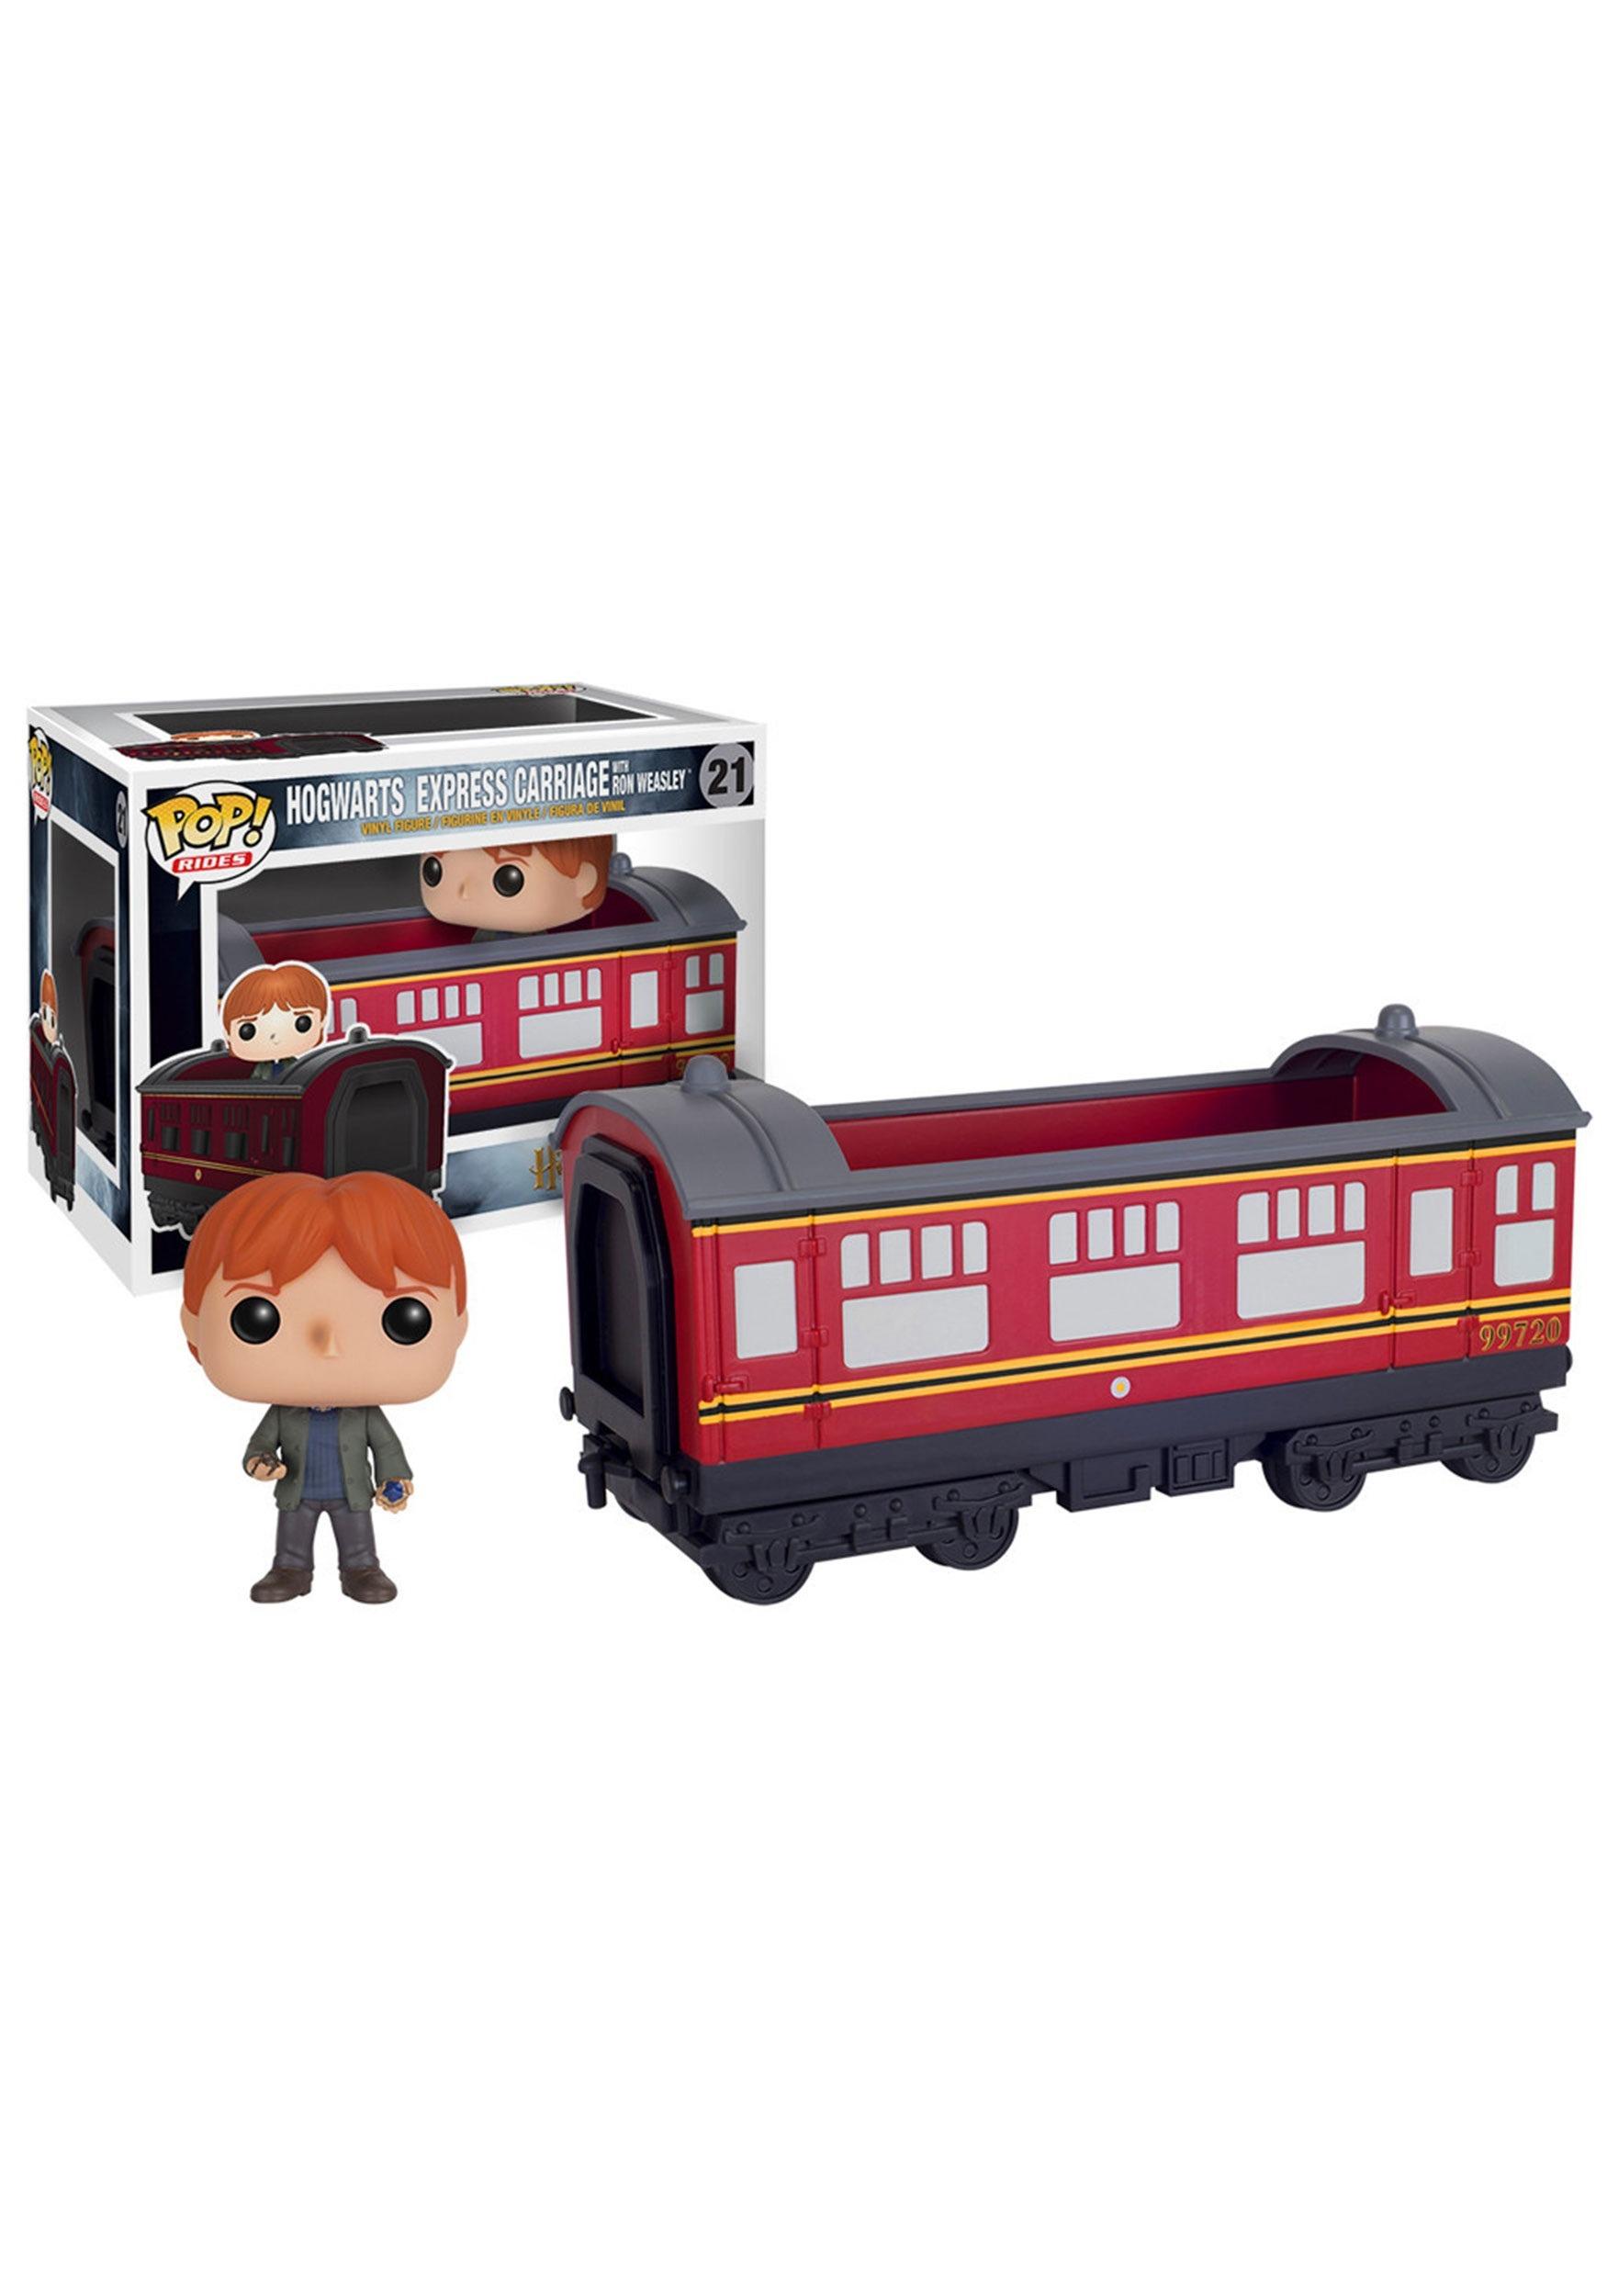 POP Harry Potter Hogwarts Express Train Car w/ Ron Weasley FN5973